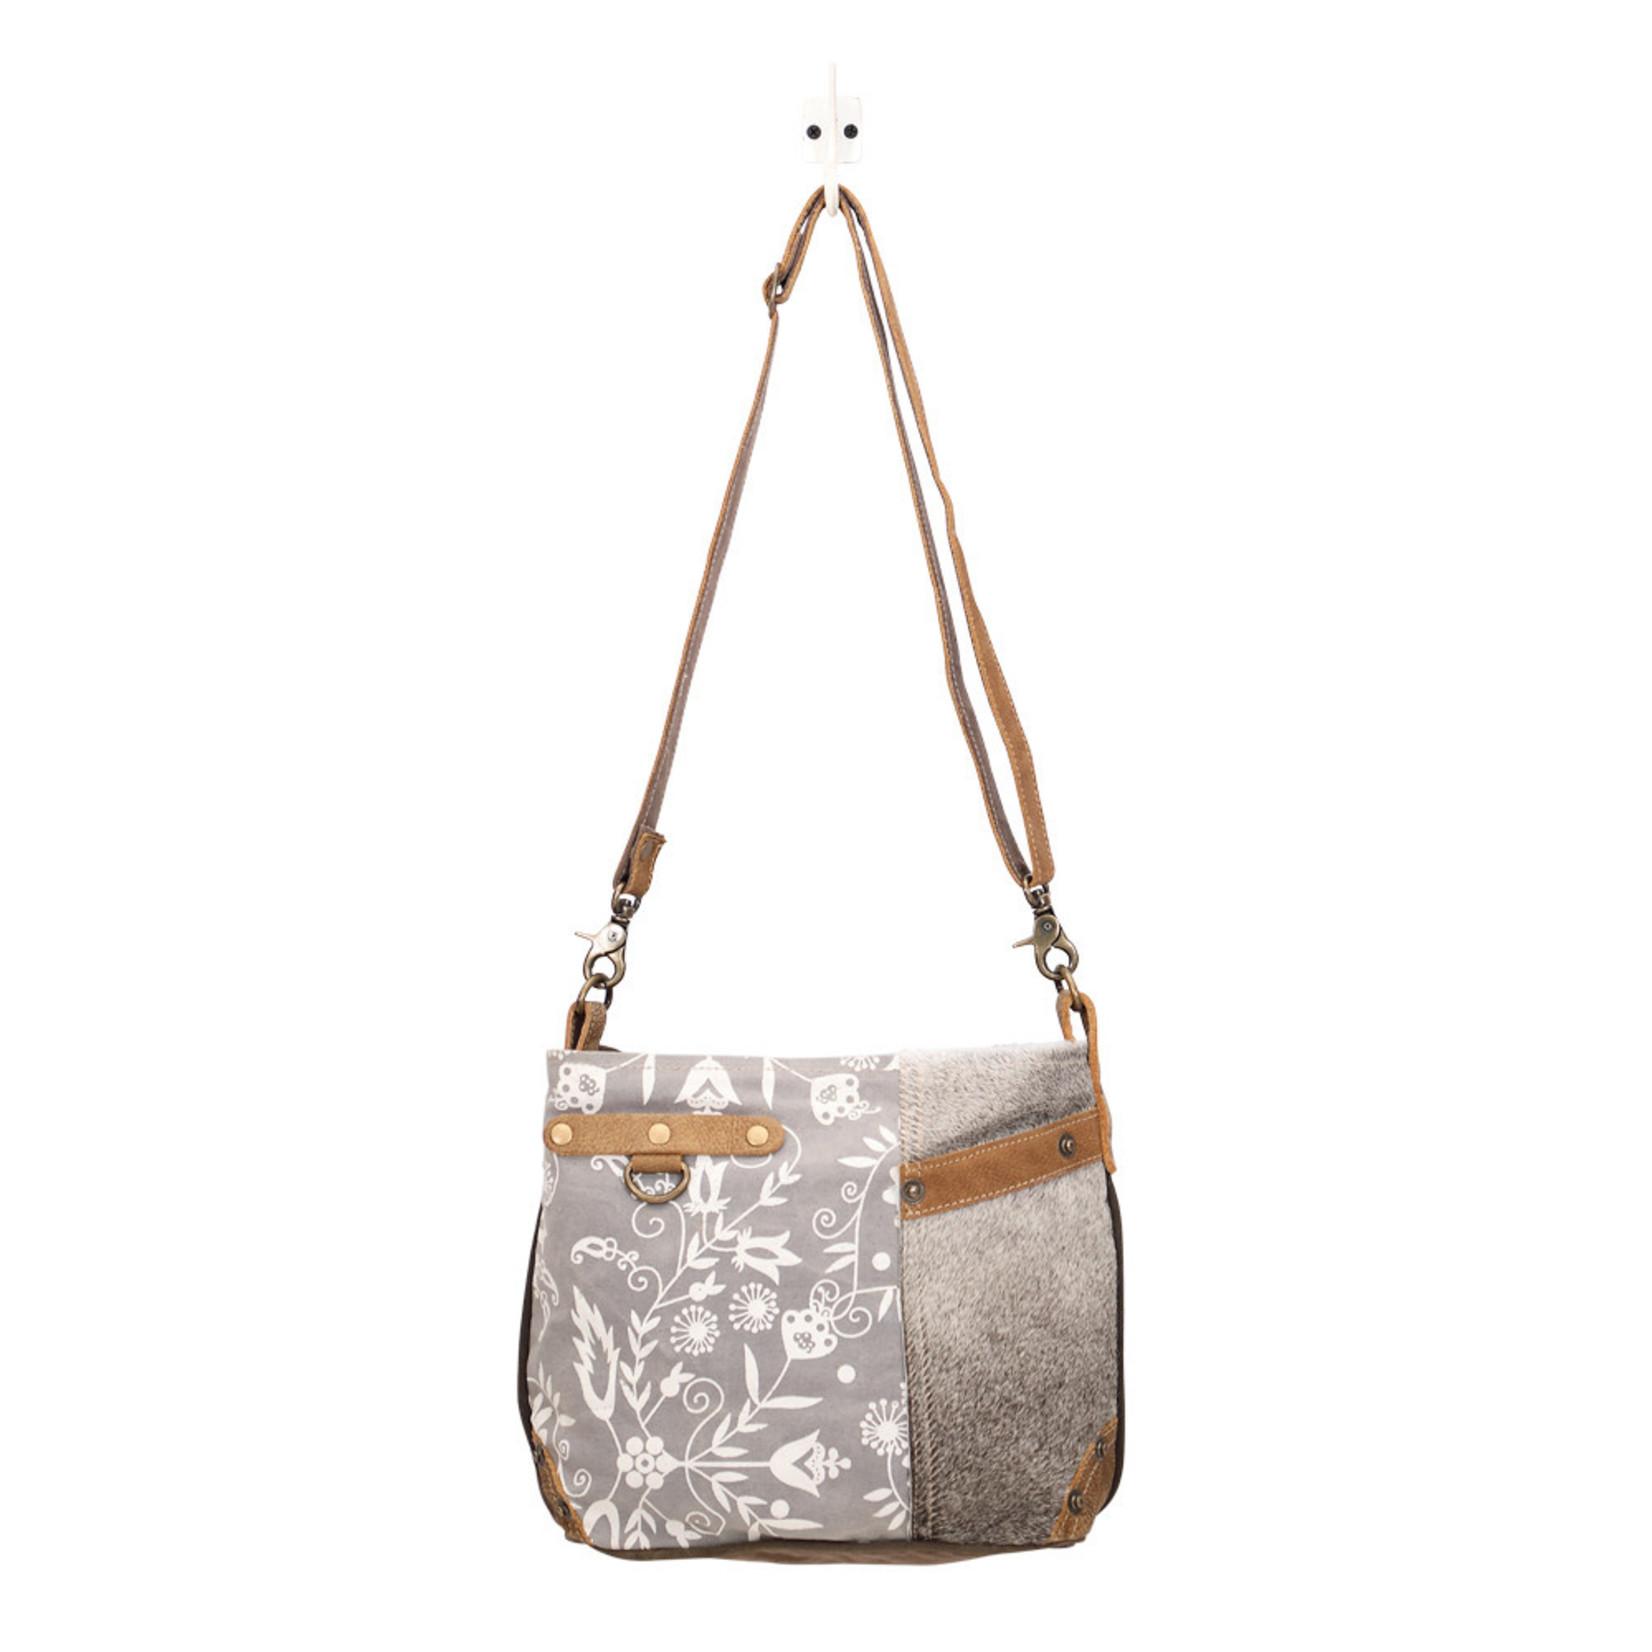 Myra Bags S-1448 Dove Shoulder Bag